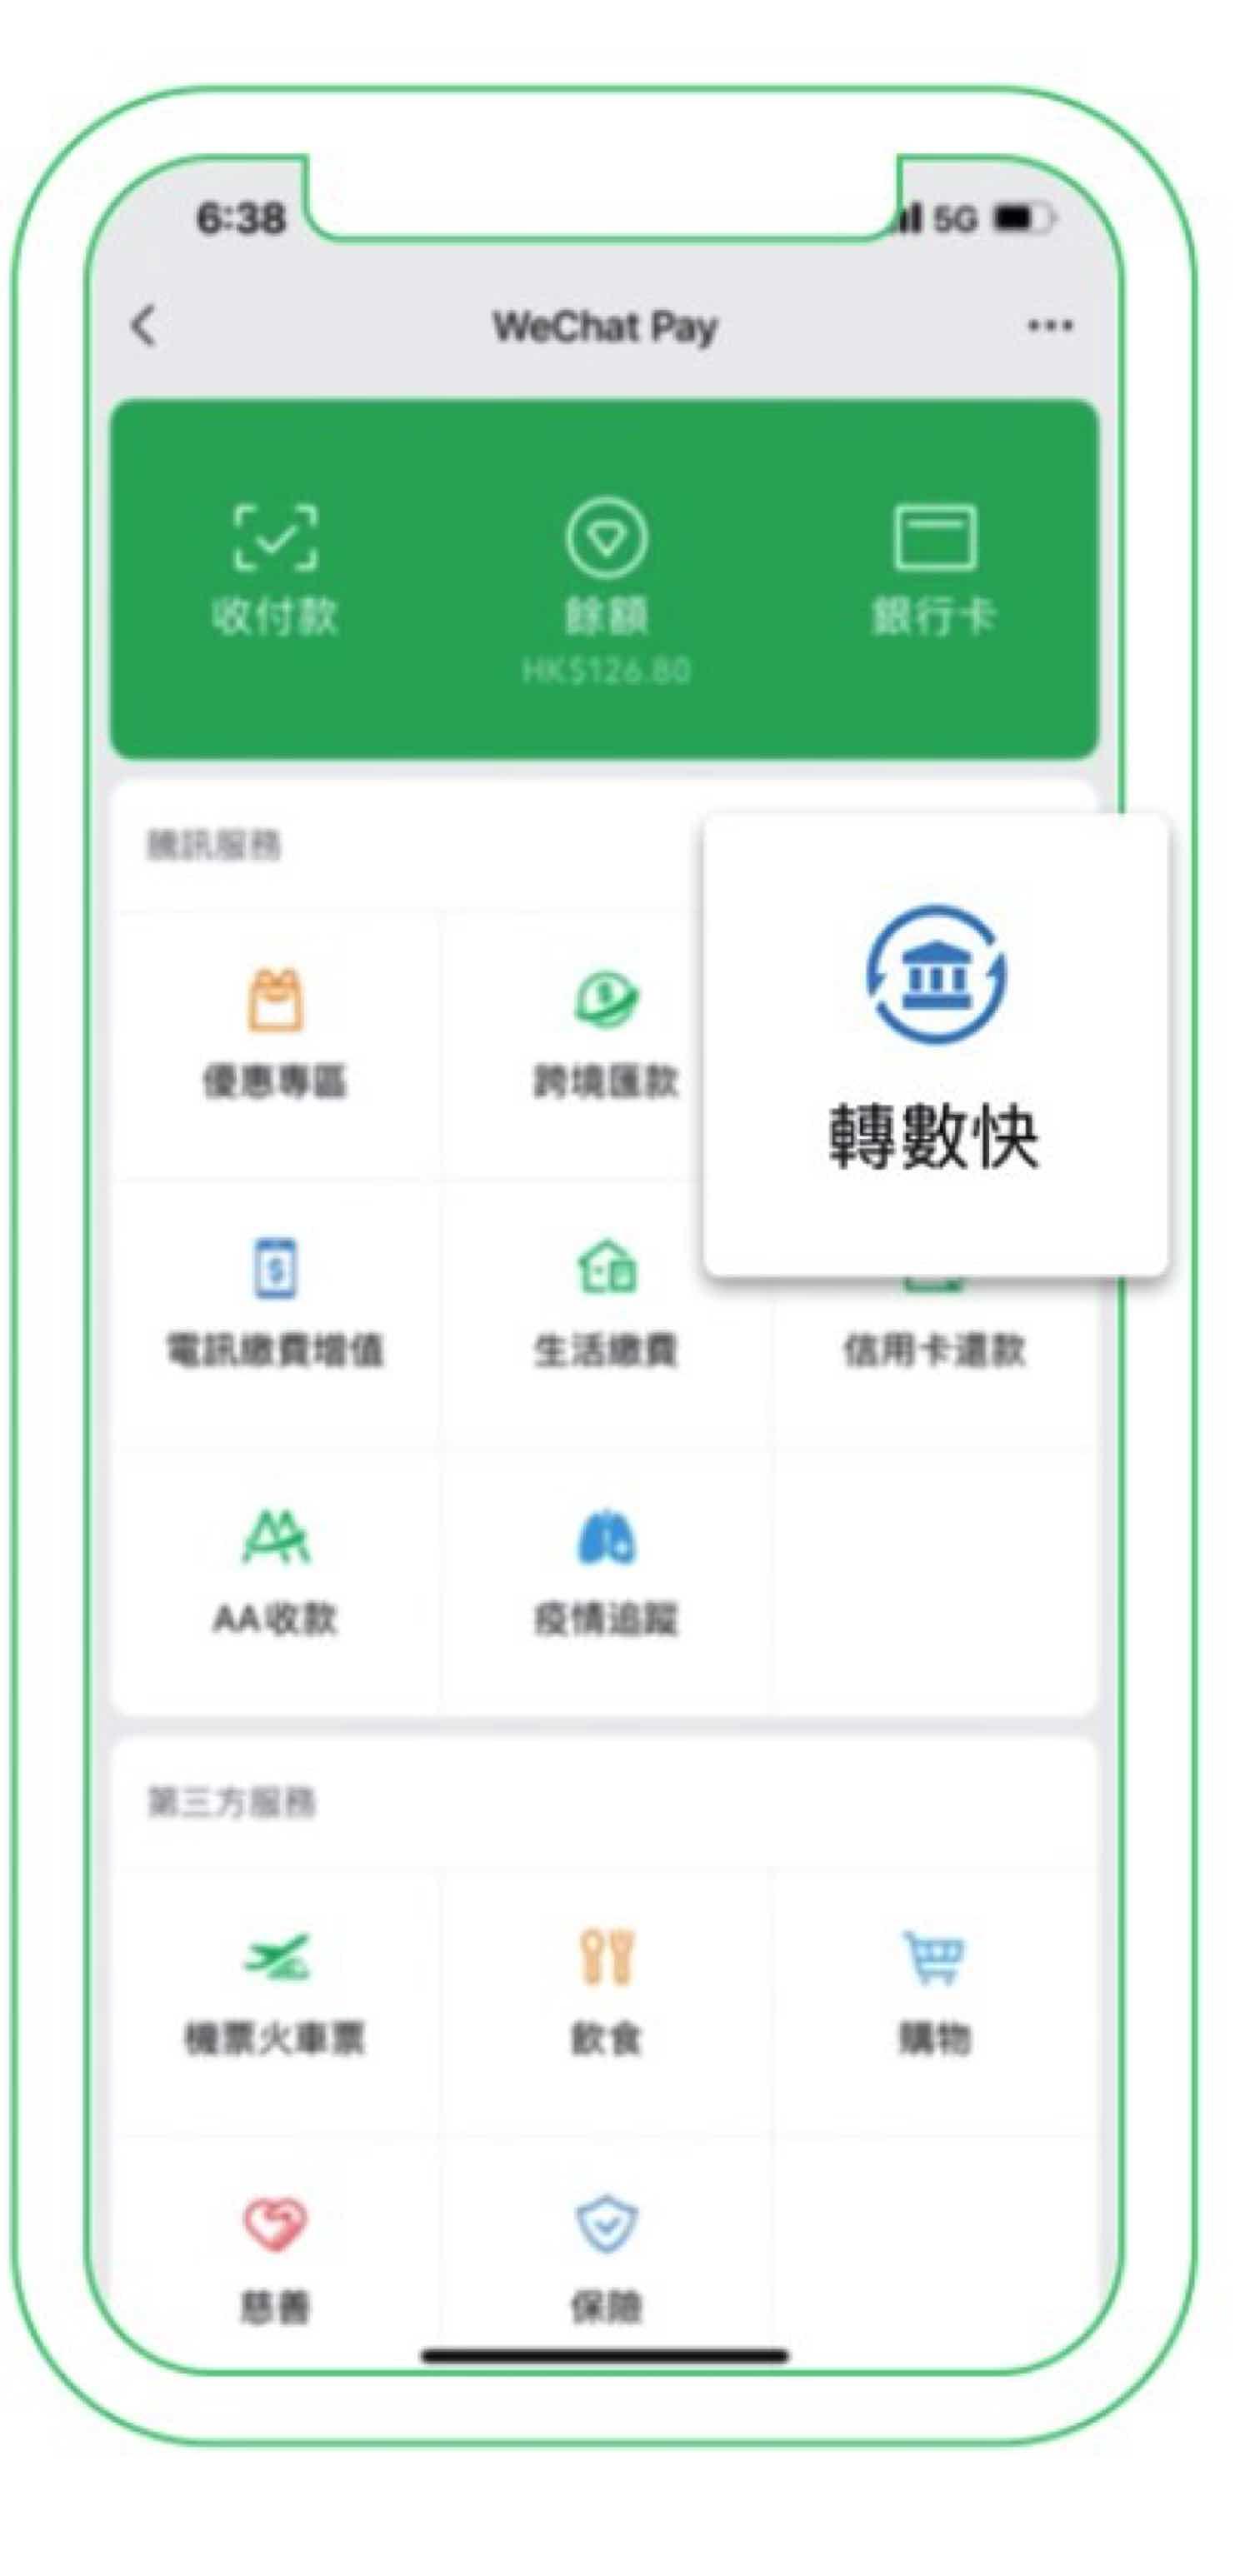 WeChat Pay HK 新增「 轉數快 」增值八達通銀包功能